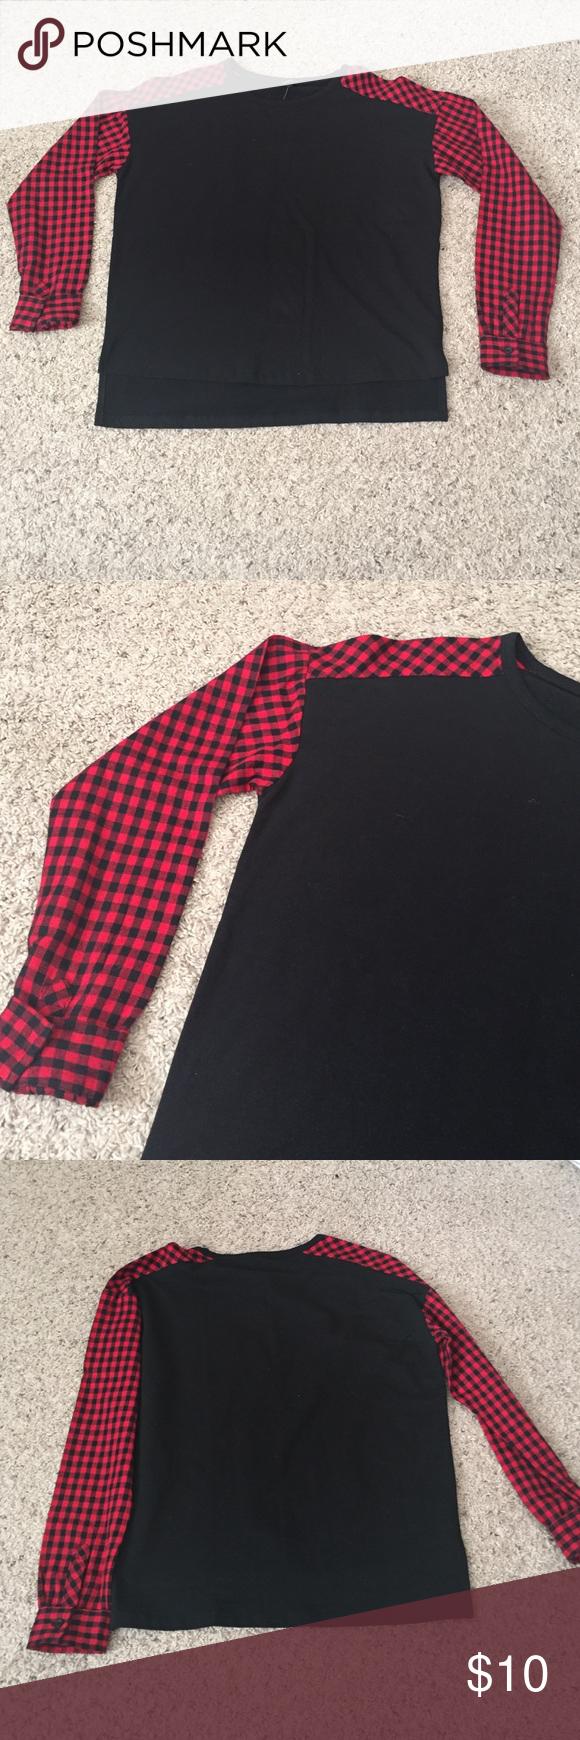 Long sleeve top, plaid sleeves Bundles available! Forever 21 Tops Tees - Long Sleeve